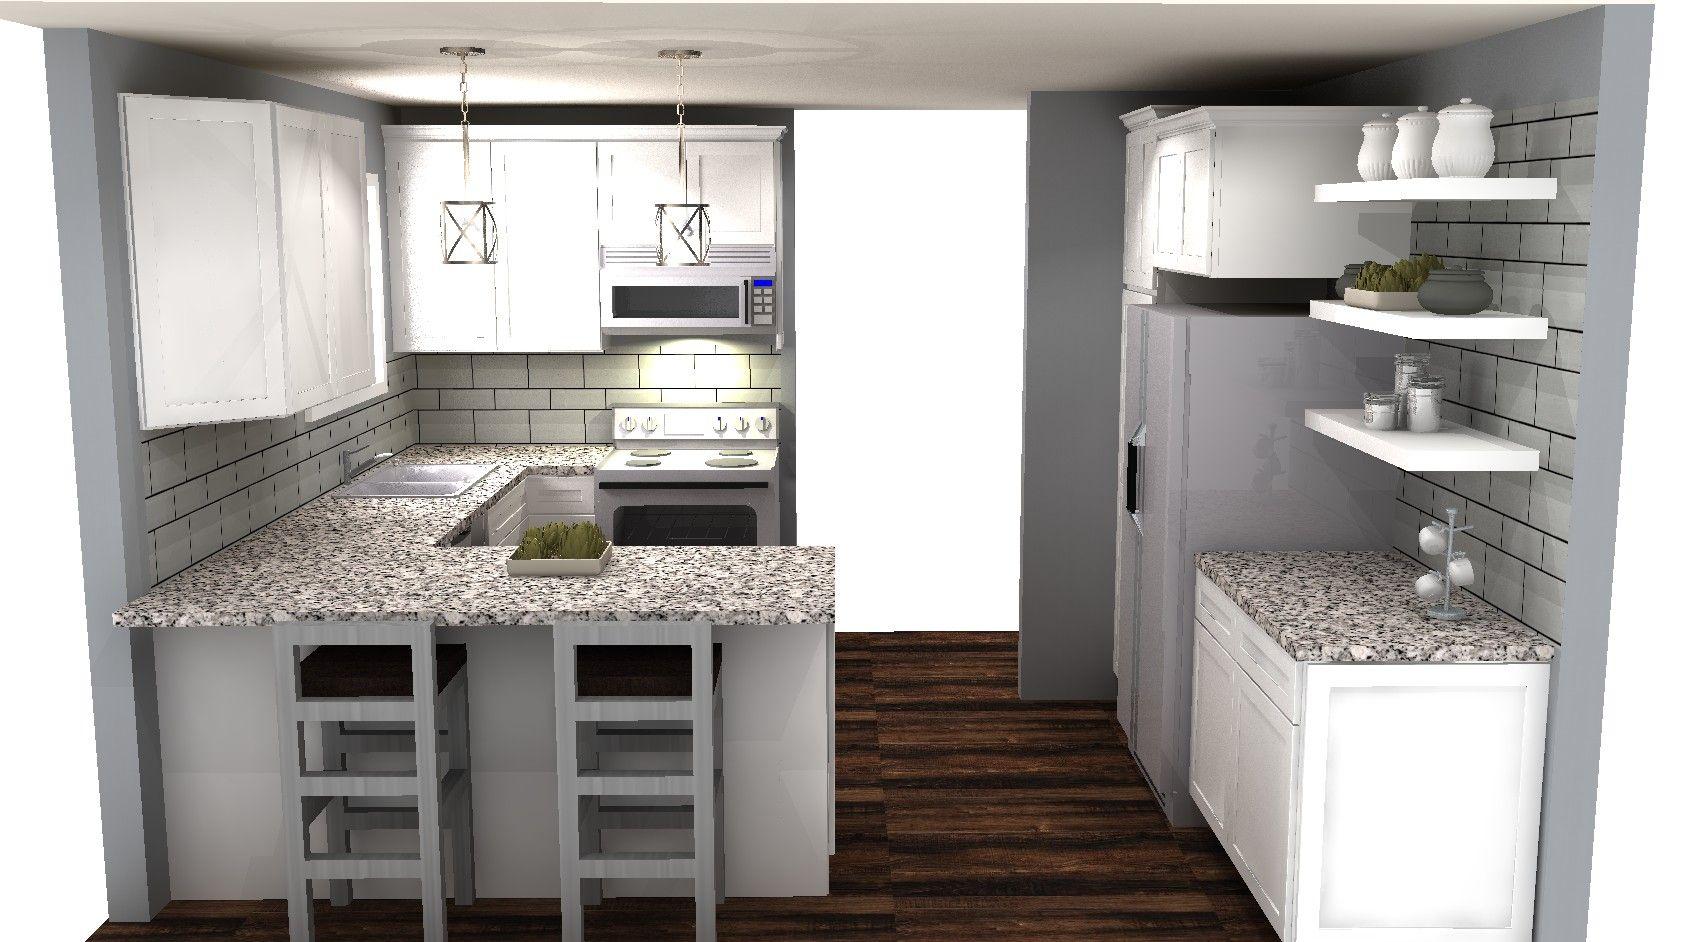 Whitehouse Kitchen redesign | Mela\'s Kitchen & Bath Designs ...